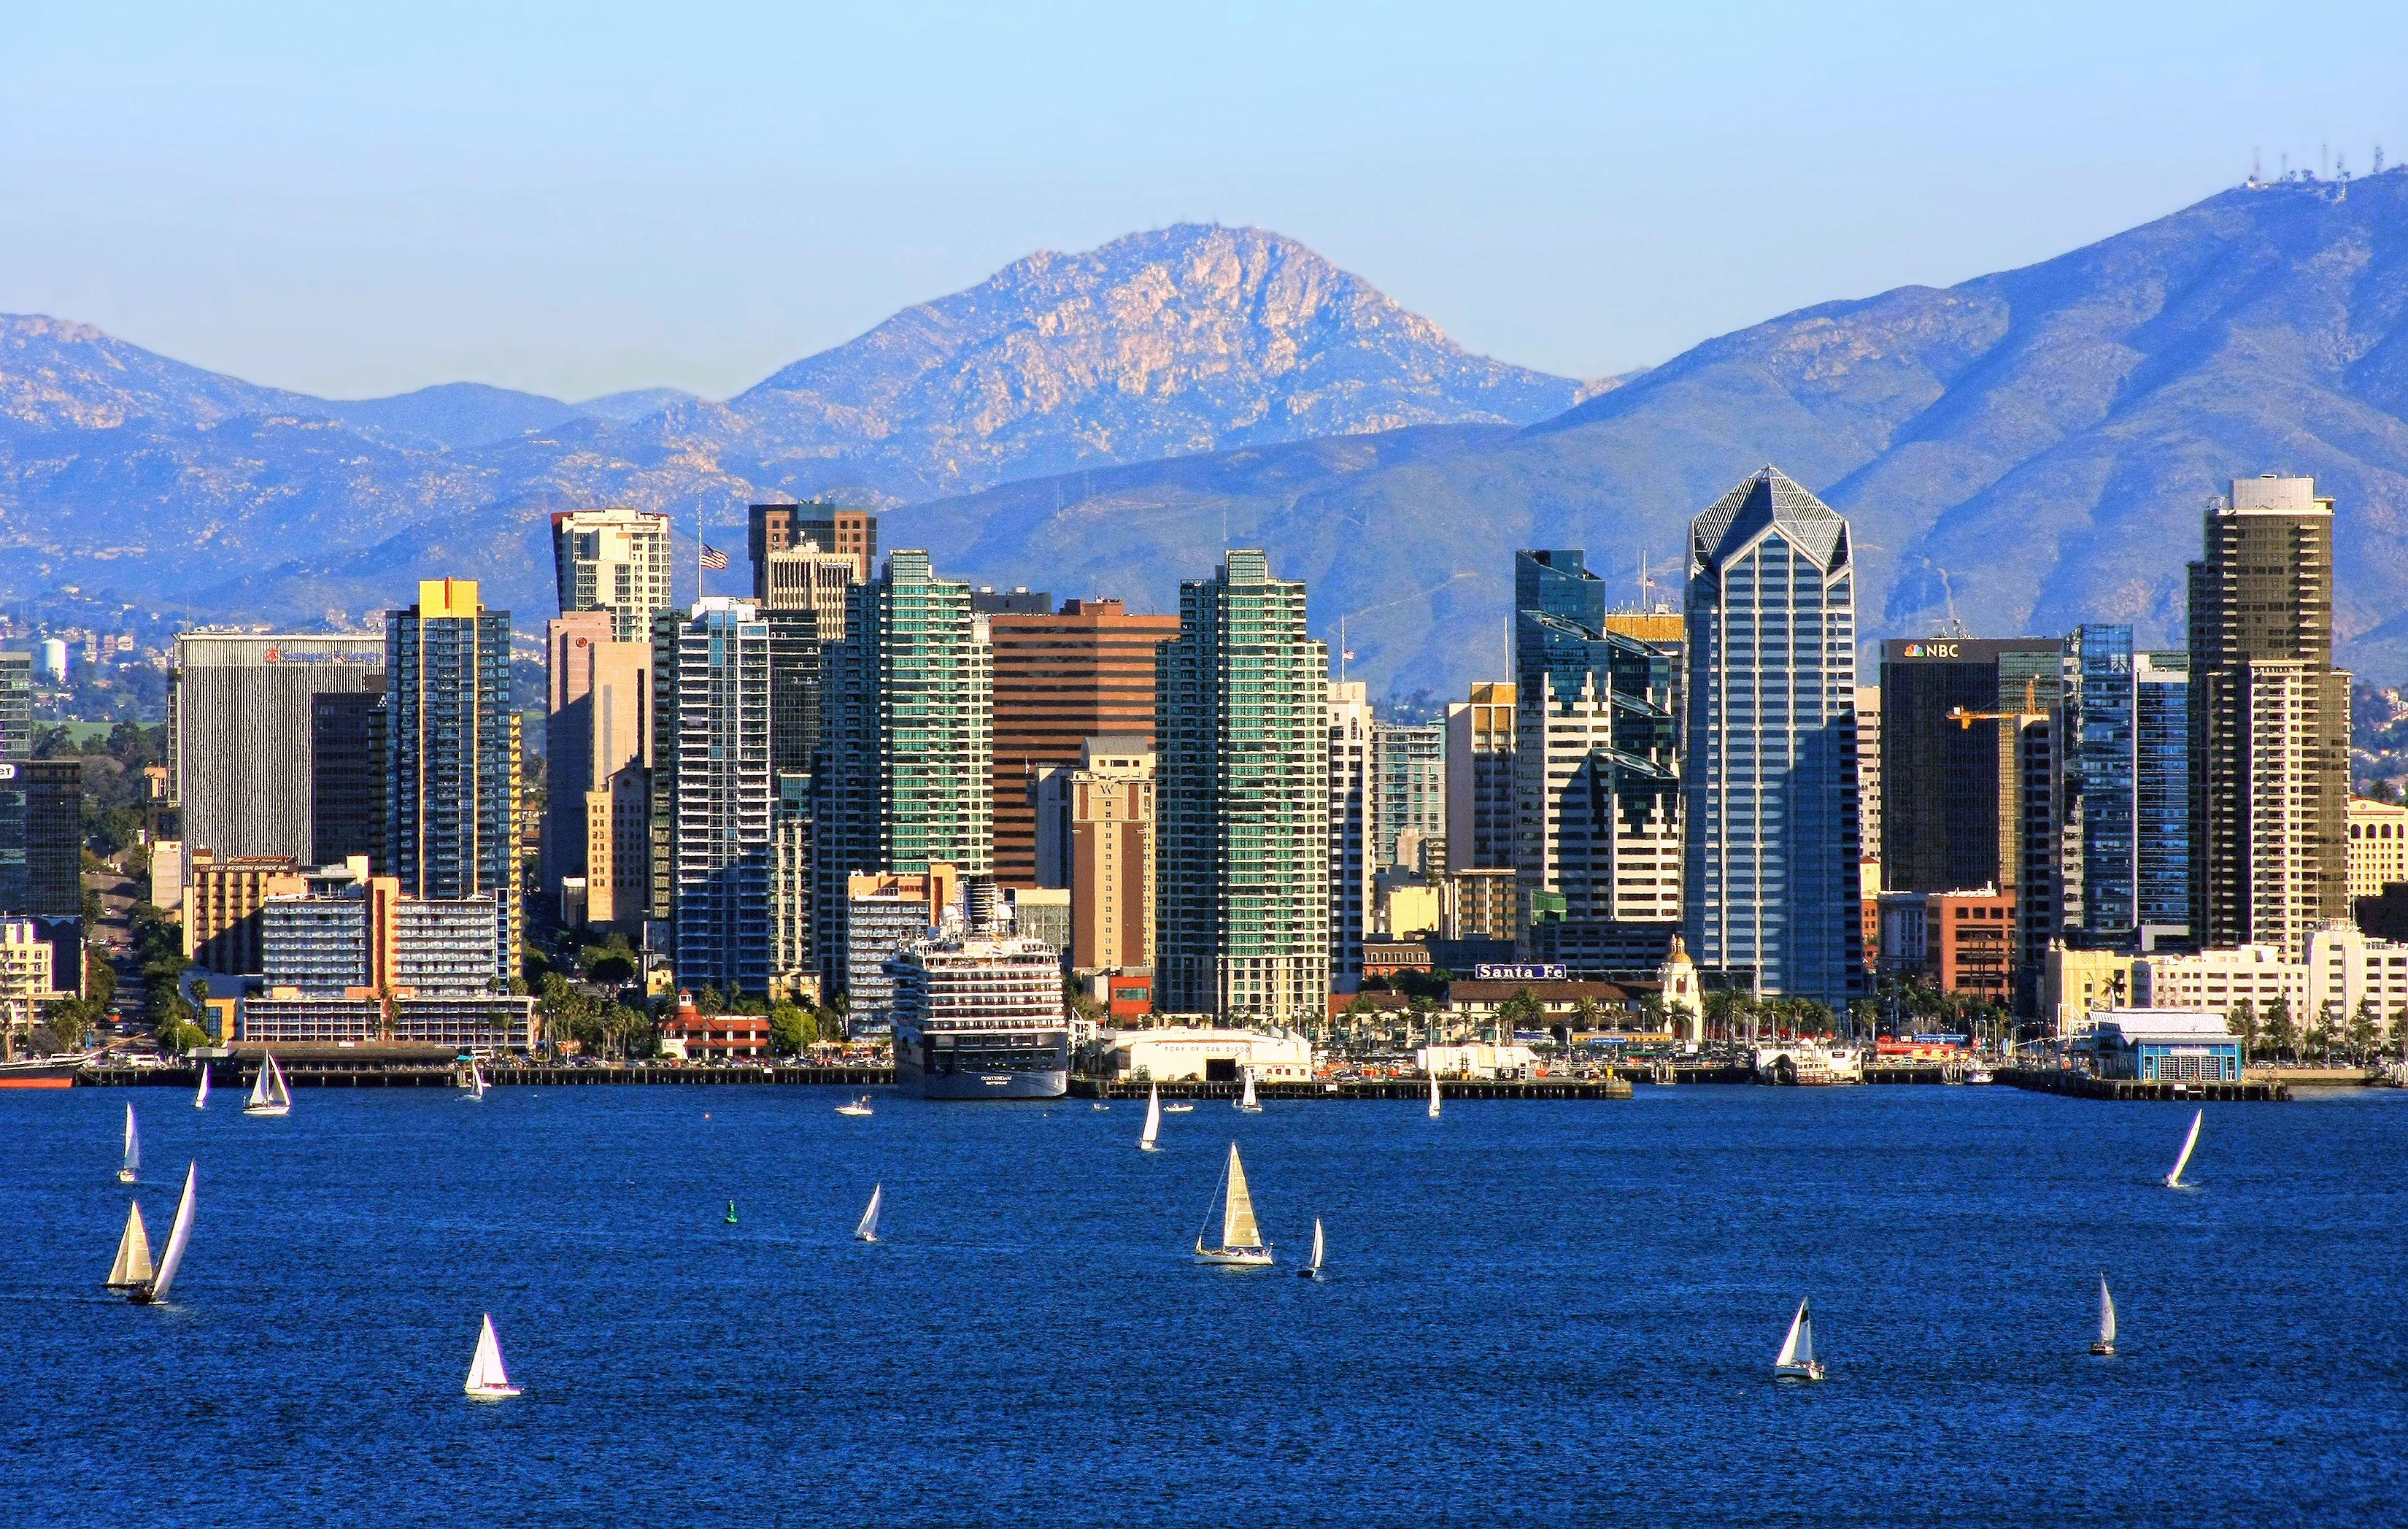 San Diego Harbor on clear day